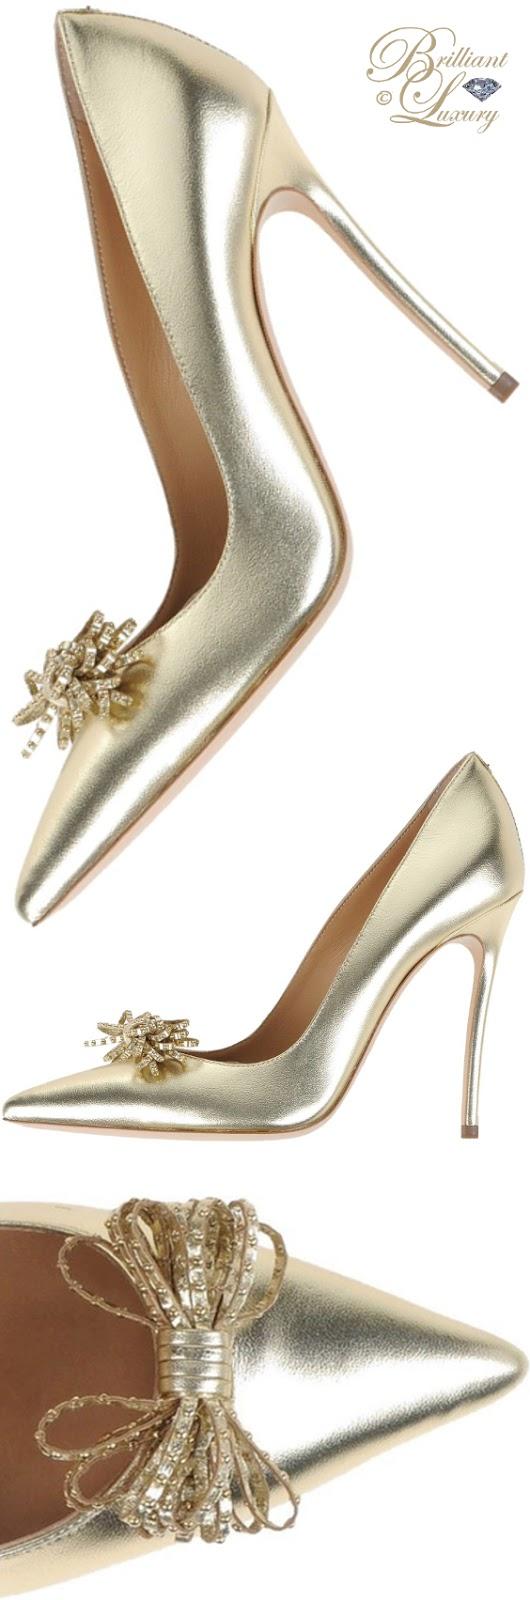 Brilliant Luxury ♦ Dsquared2 golden evening pumps